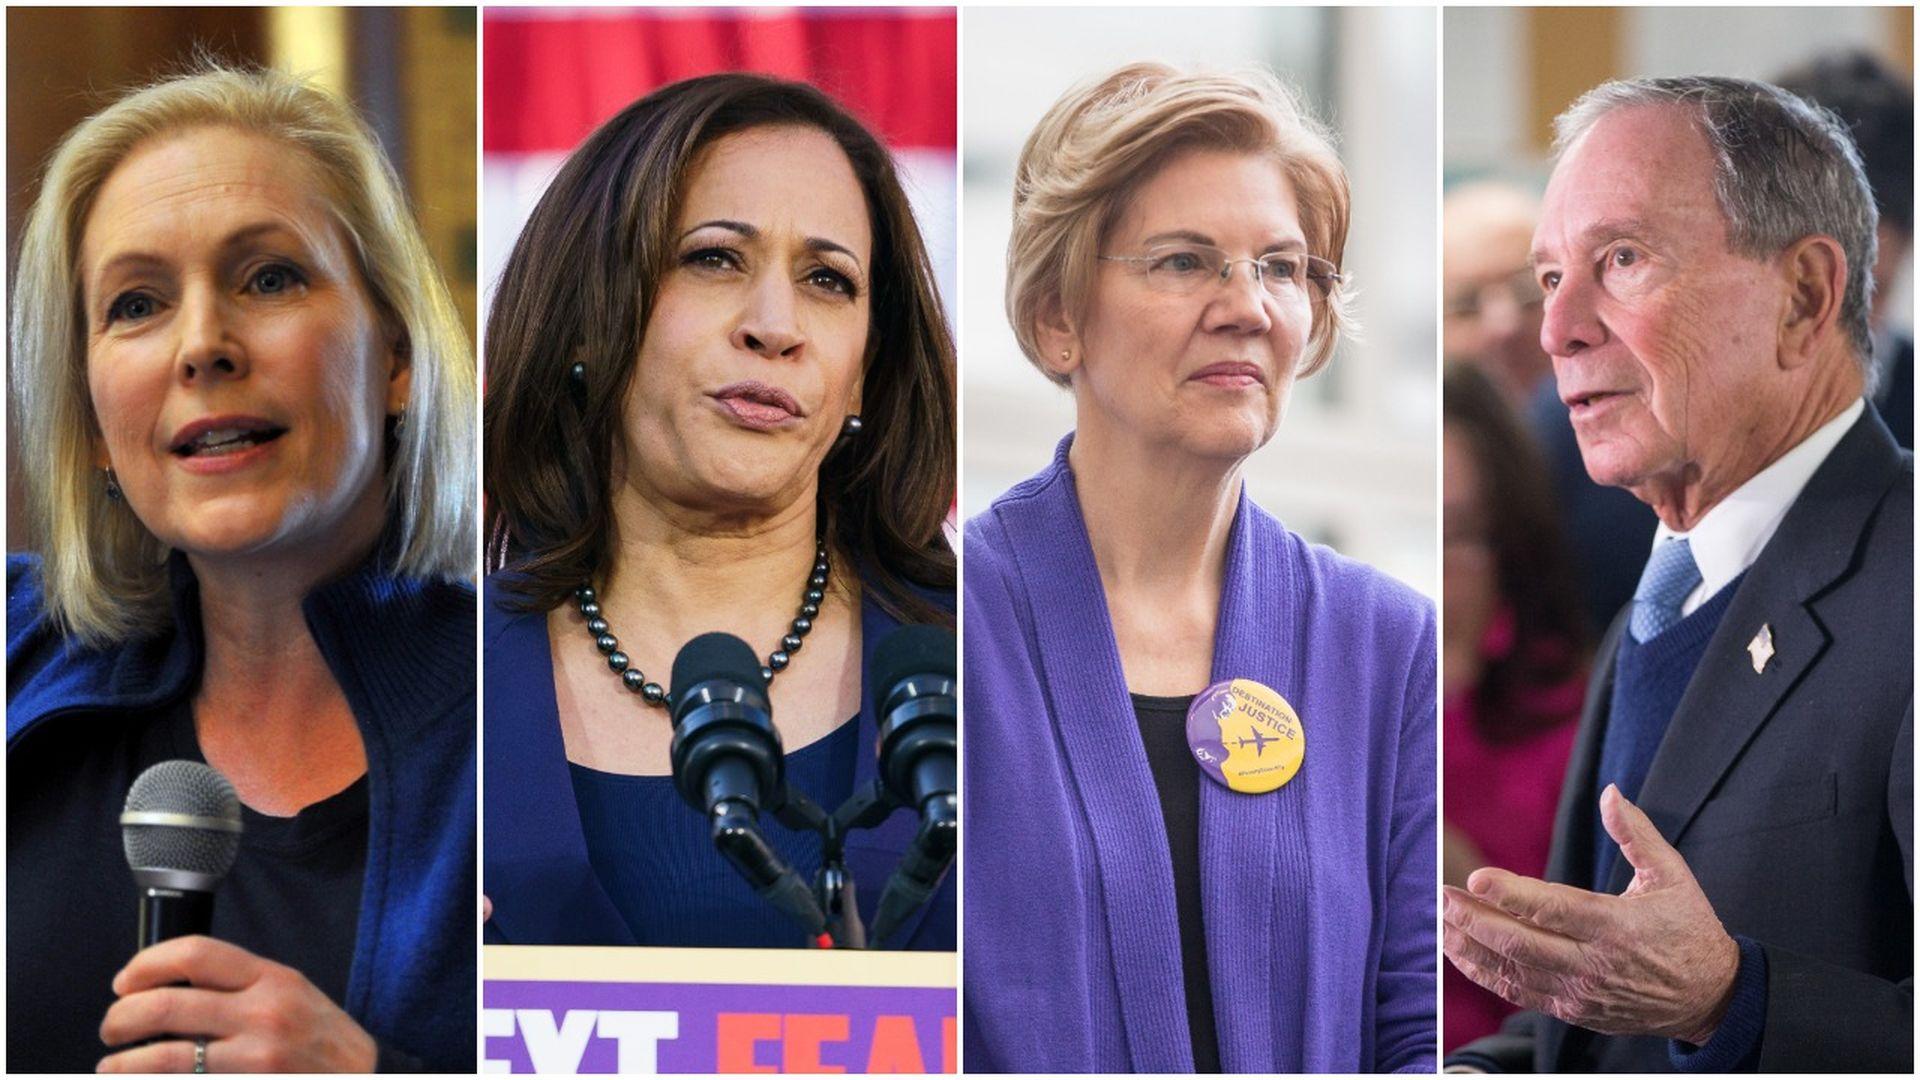 Sen. Kirsten Gillibrand, Sen. Kamala Harris, Sen. Elizabeth Warren and Michael Bloomberg.